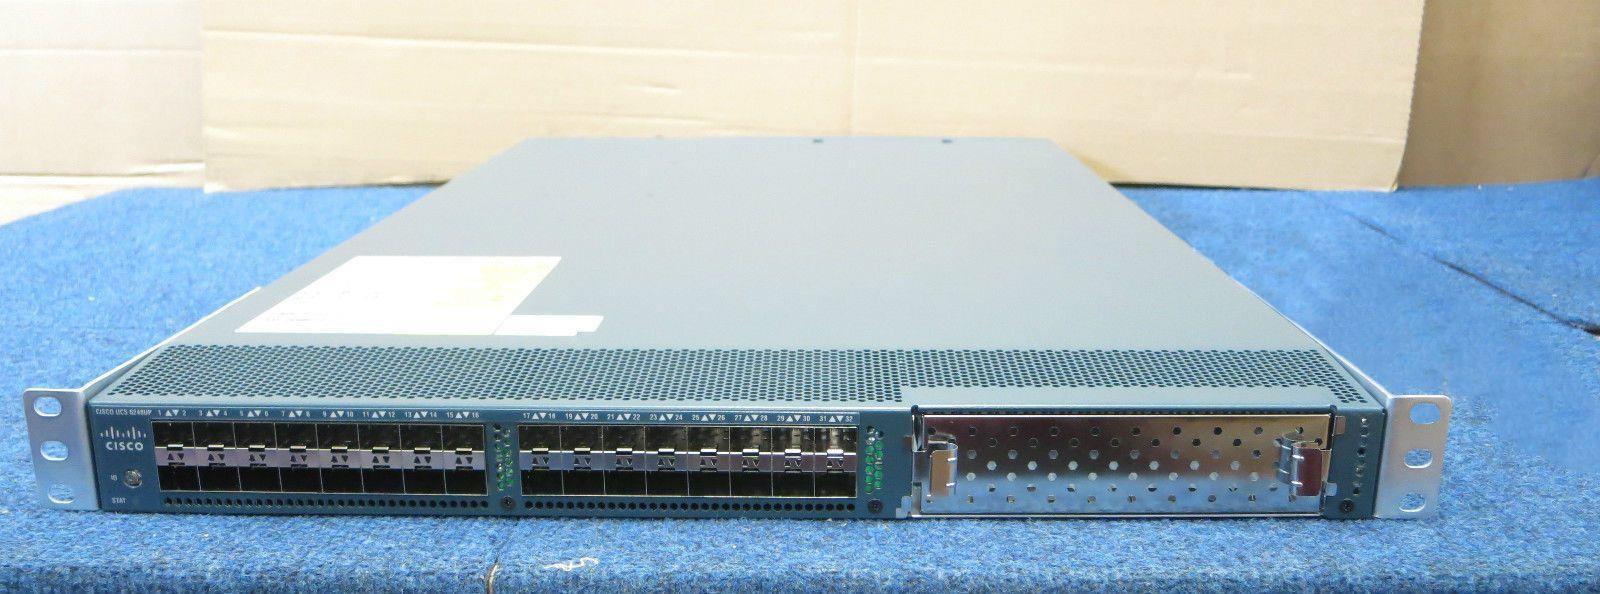 CISCO 6248 UCS-FI-6248UP UCS FABRIC INTERCONNECT SWITCH 2x PSU 68-3976